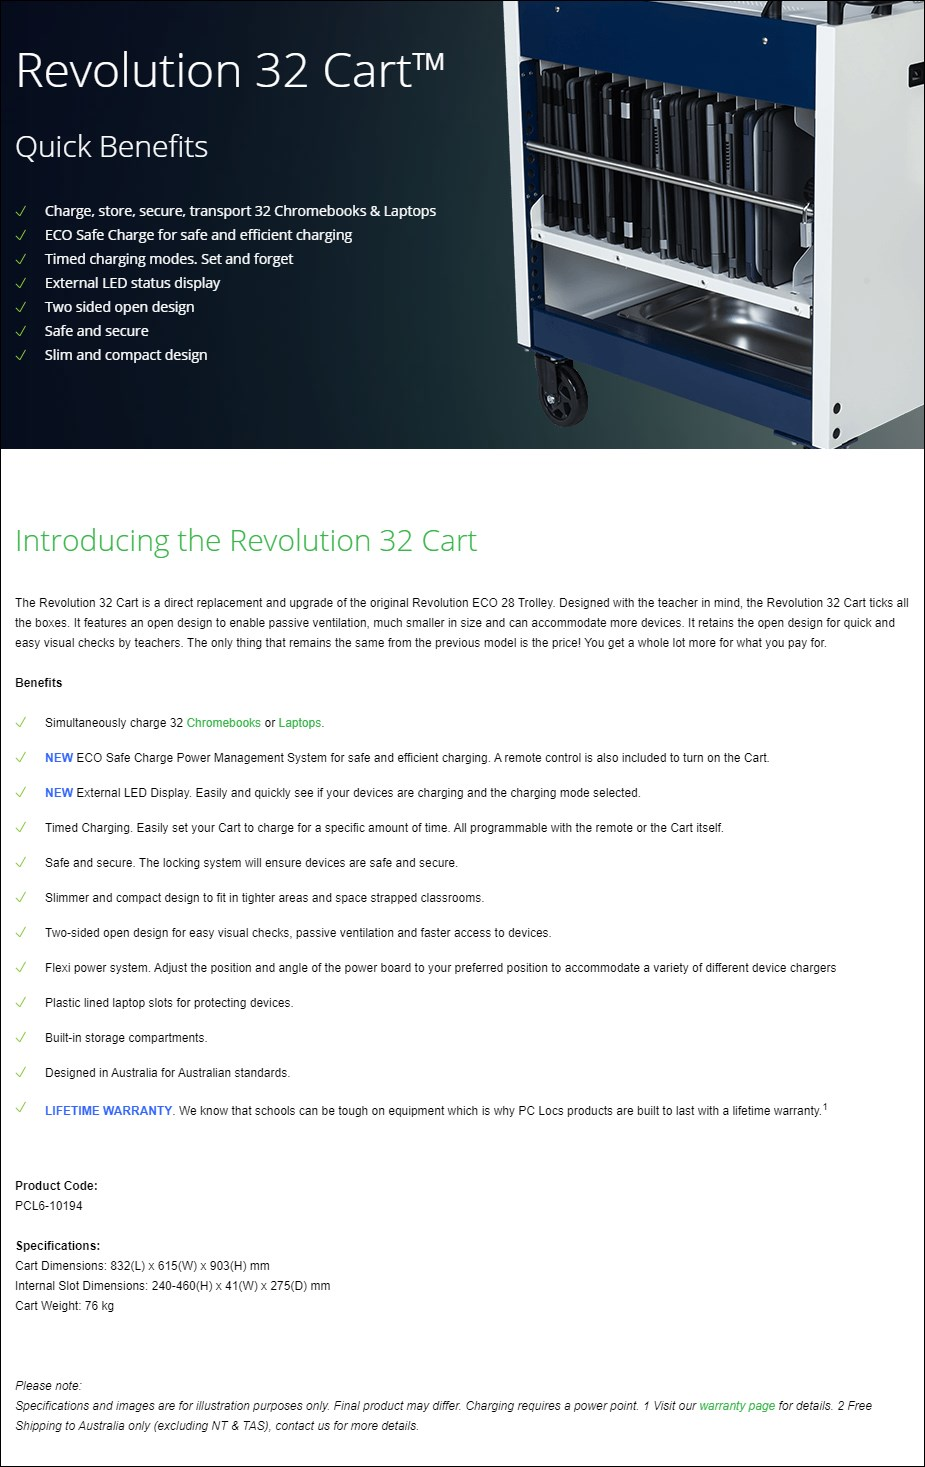 PC Locs Revolution 32 Cart - Overview 1